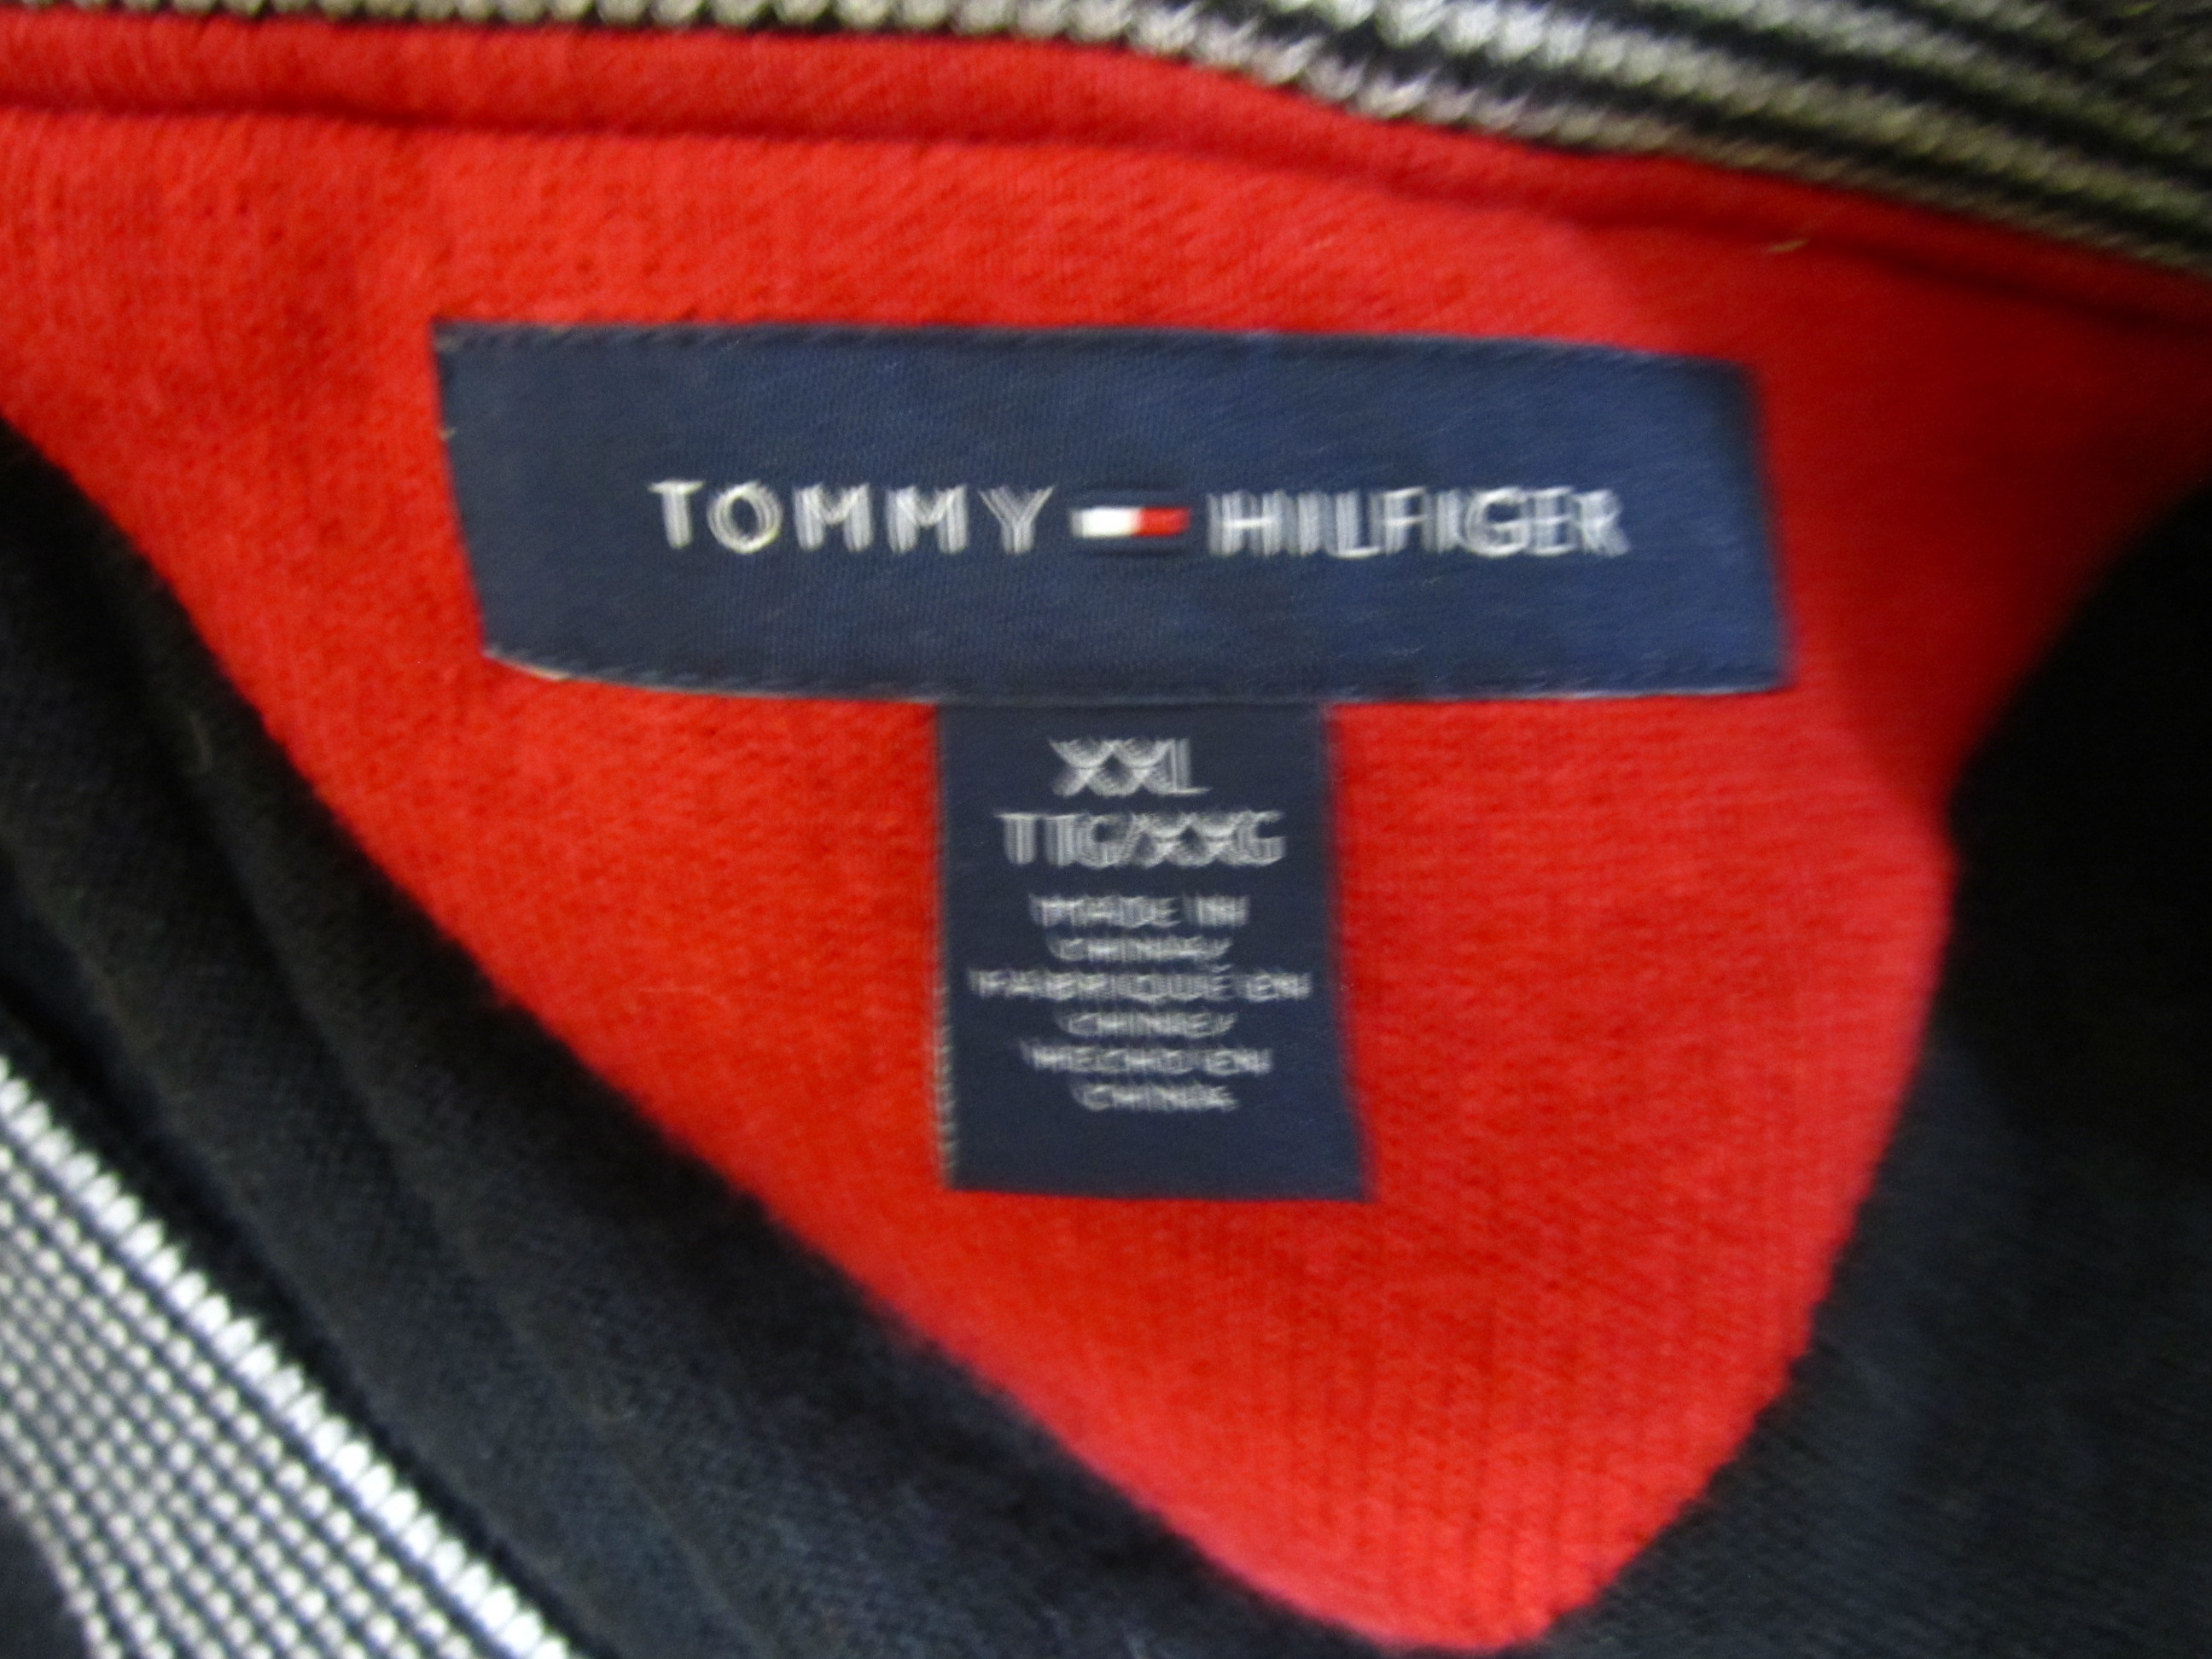 Tommy Hilfiger Cardigan Xxl On Storenvy